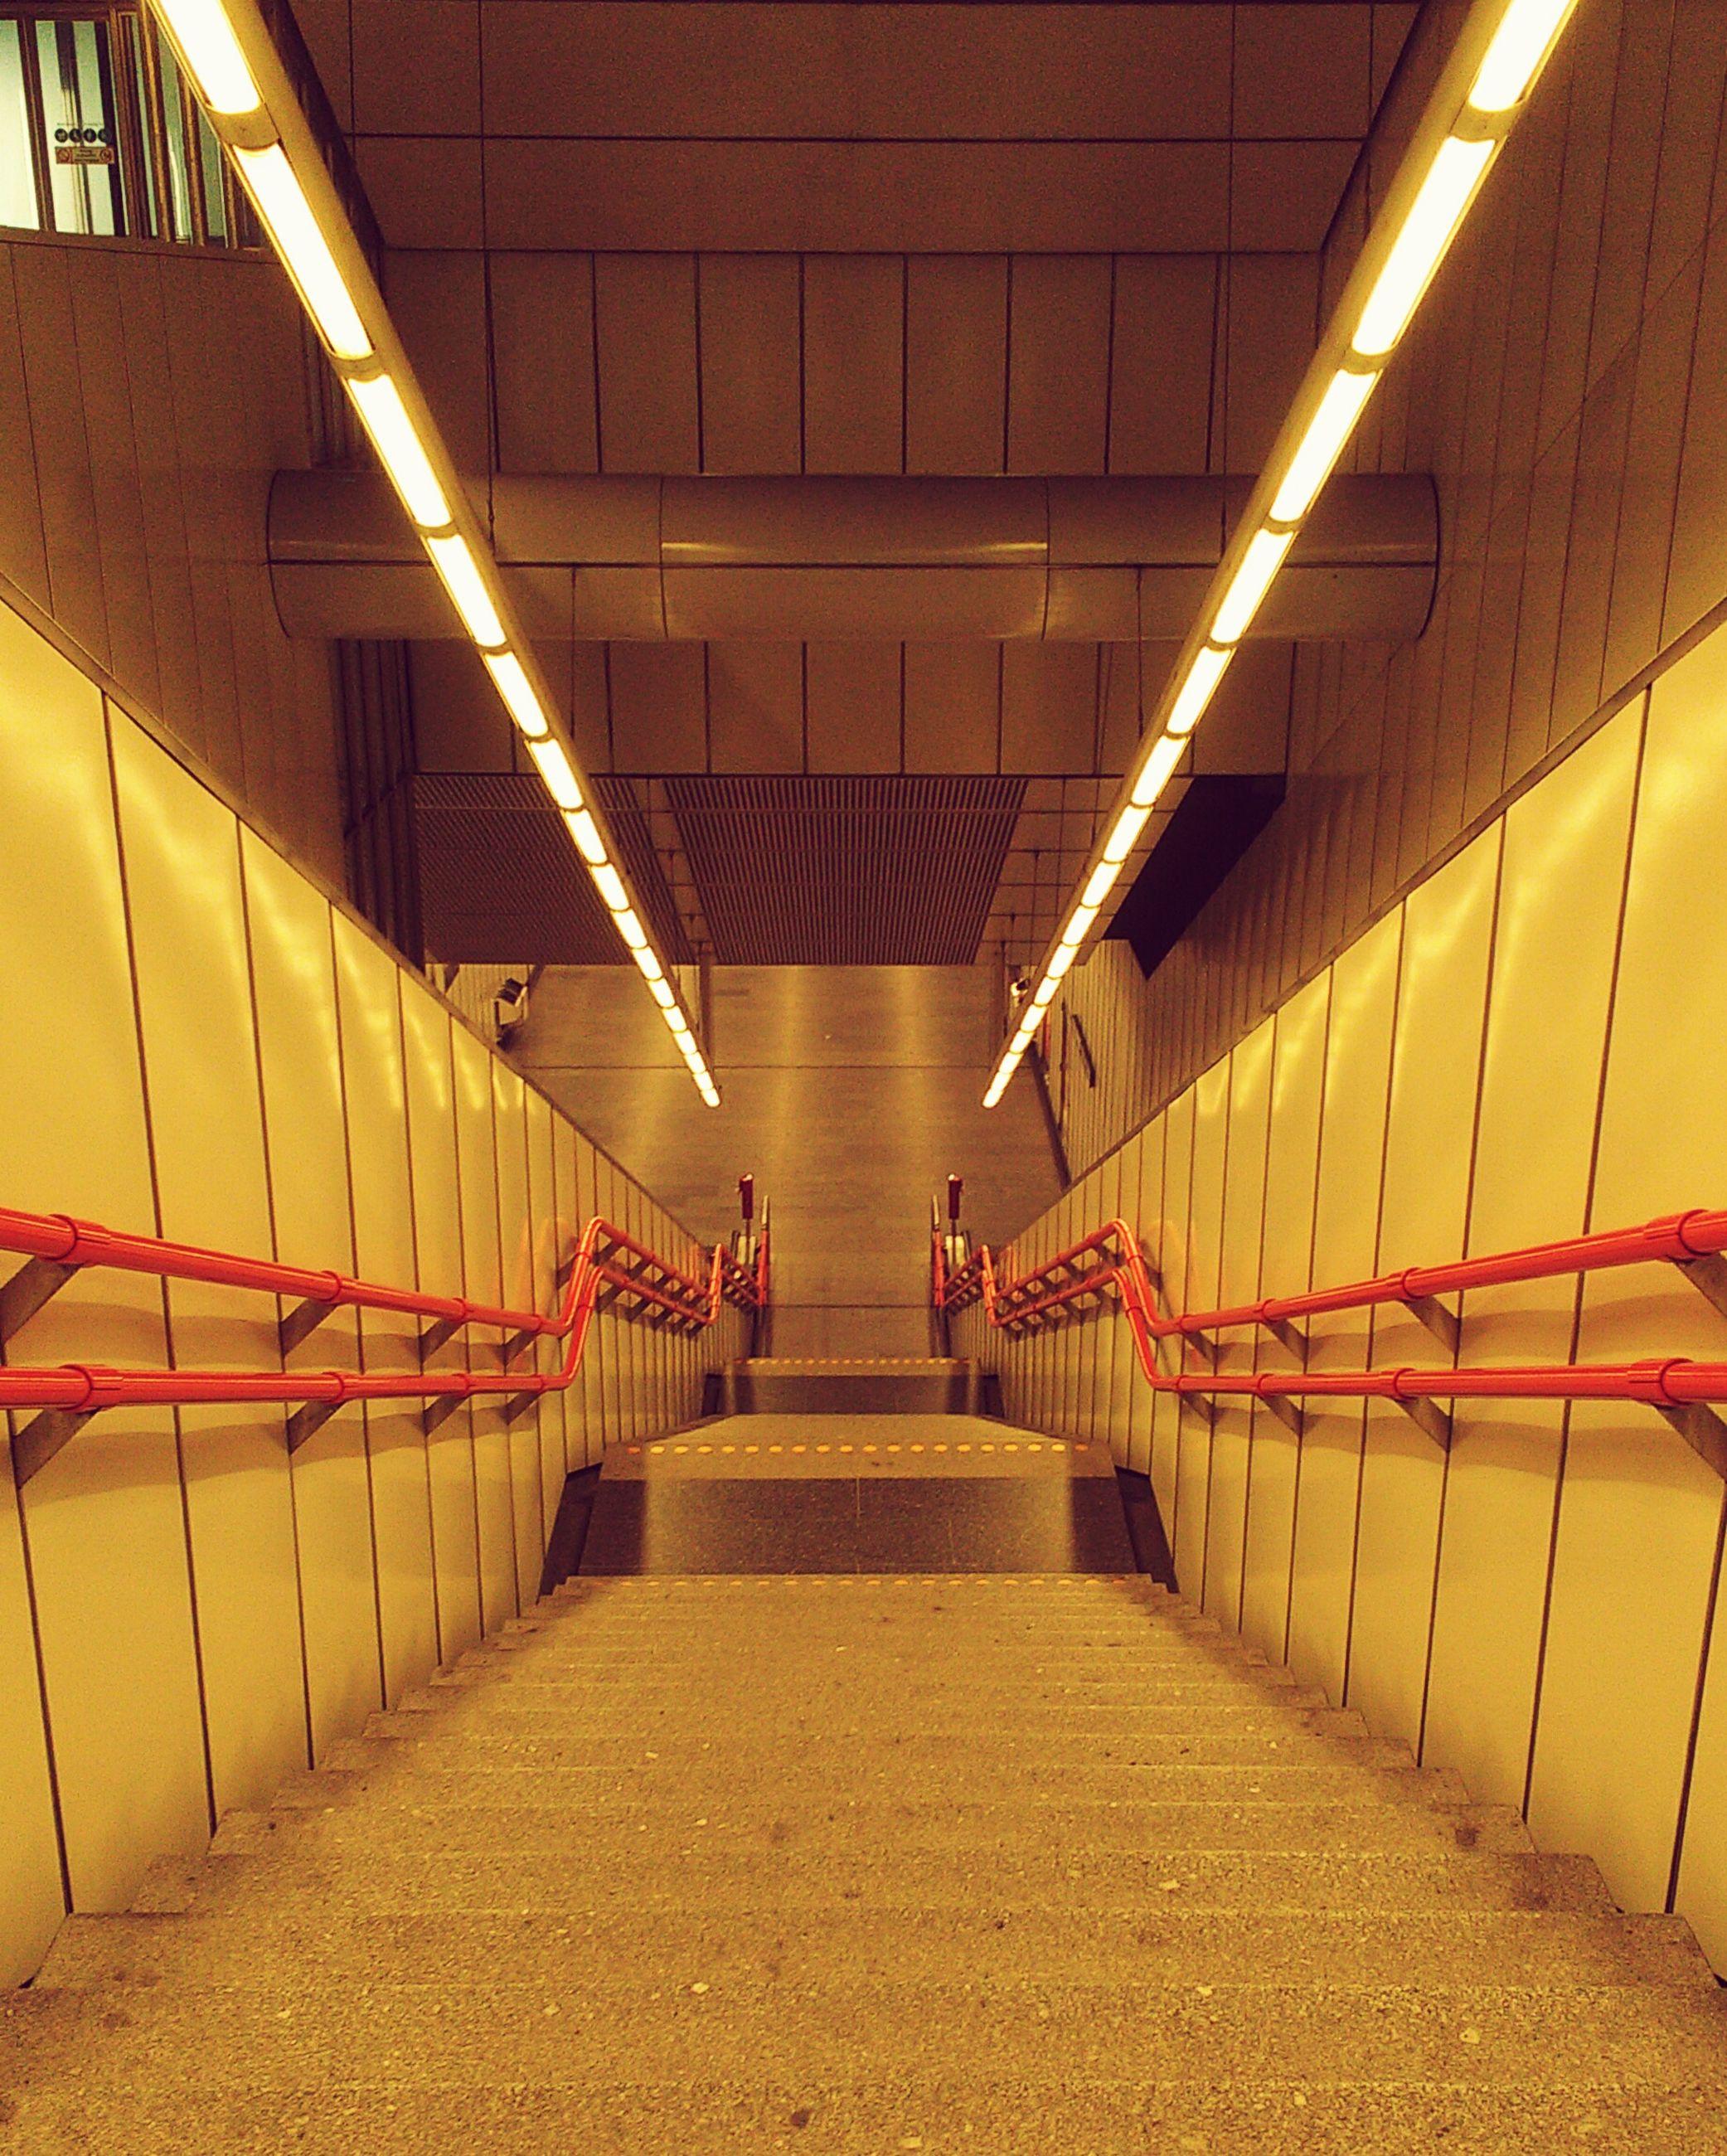 illuminated, indoors, lighting equipment, modern, ceiling, architecture, escalator, long, tunnel, subway station, the way forward, railing, narrow, city life, pedestrian walkway, electric light, underpass, convenience, diminishing perspective, fluorescent light, underground walkway, subway platform